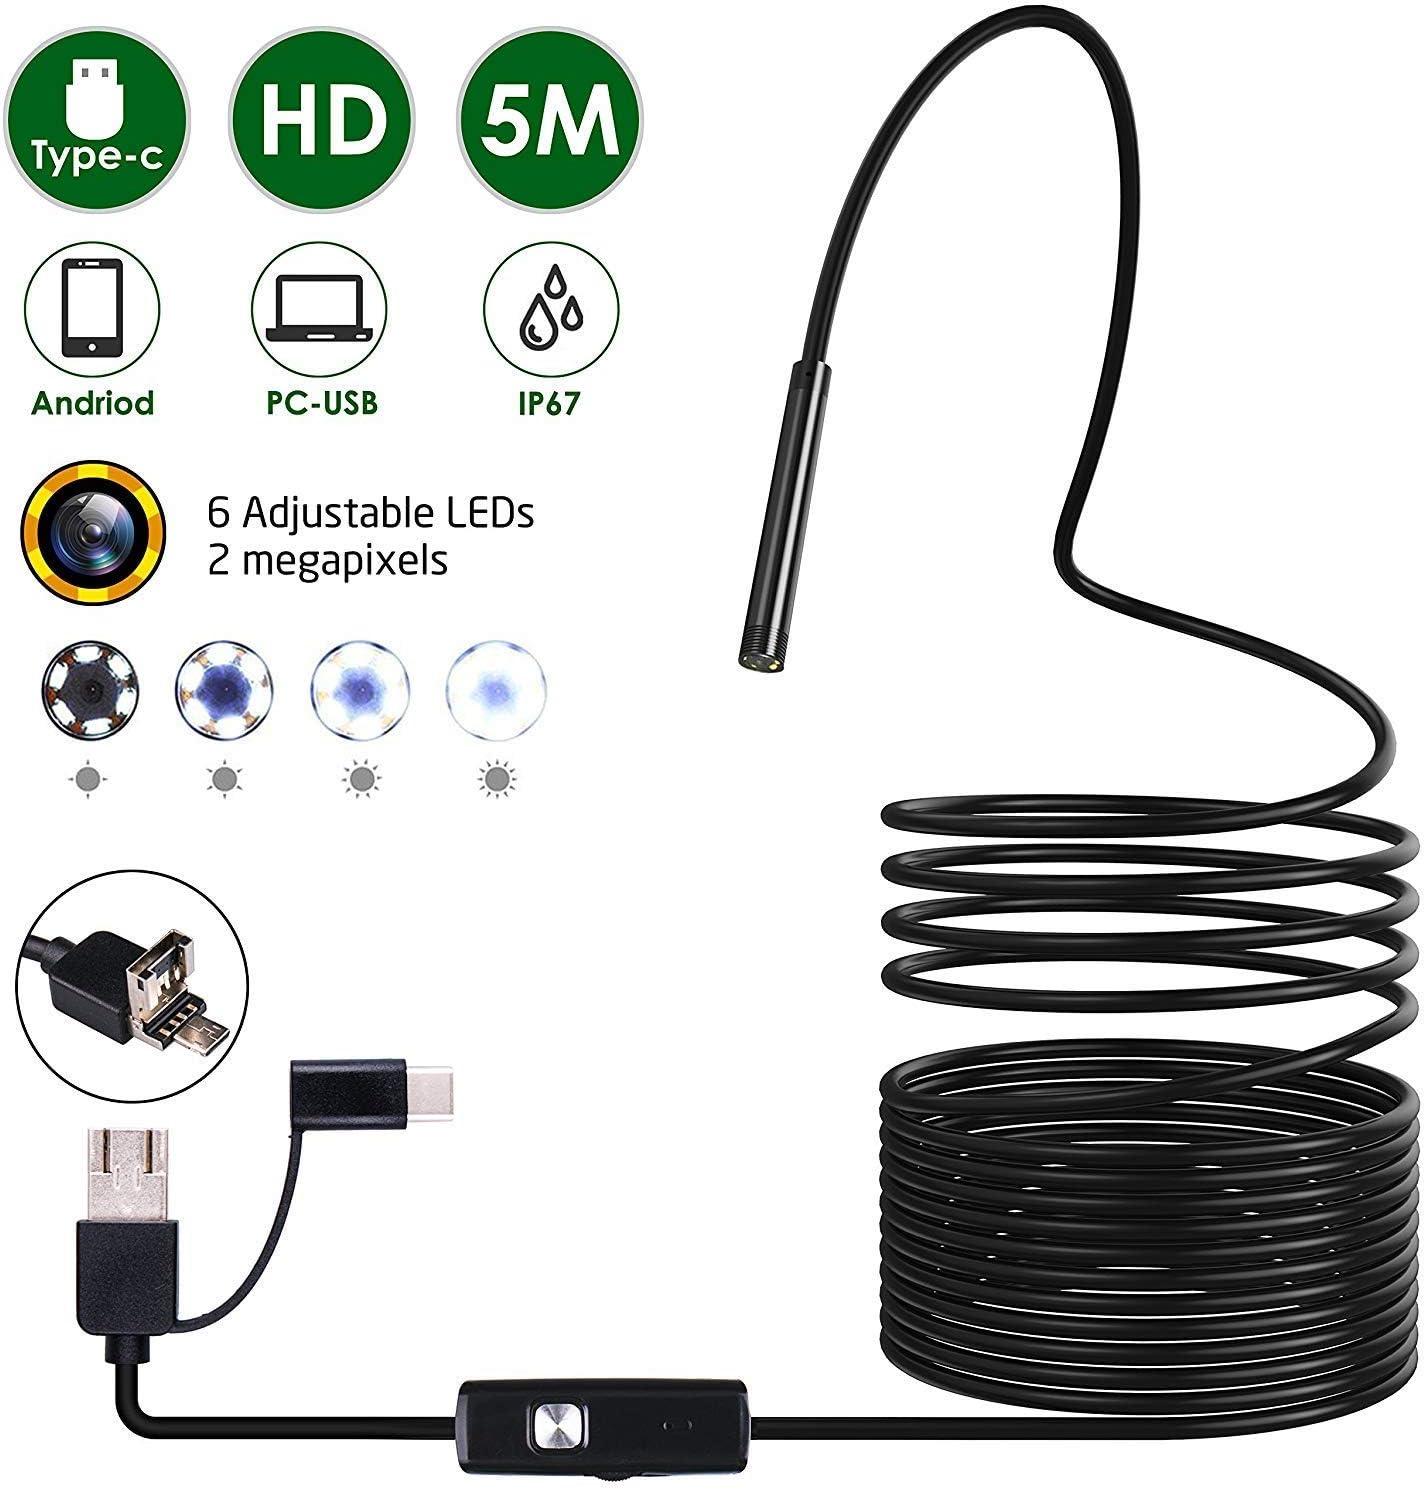 Omew Endoscopio USB, Cámara de Inspección, 3 en 1 Tipo-c Micro USB y PC Cámara de inspección con boroscopio Android - Equipo Combo de endoscopio de 5 Metros. para Android teléfonos Inteligentes